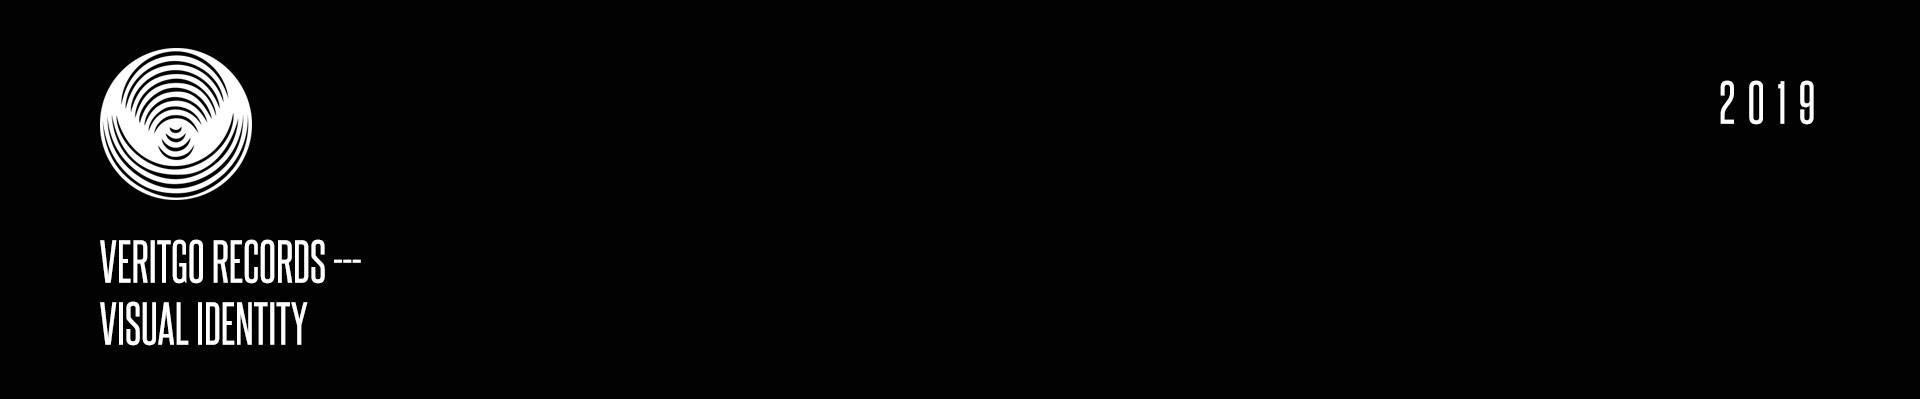 76df7c80494581.5ce314d2787b0.jpg